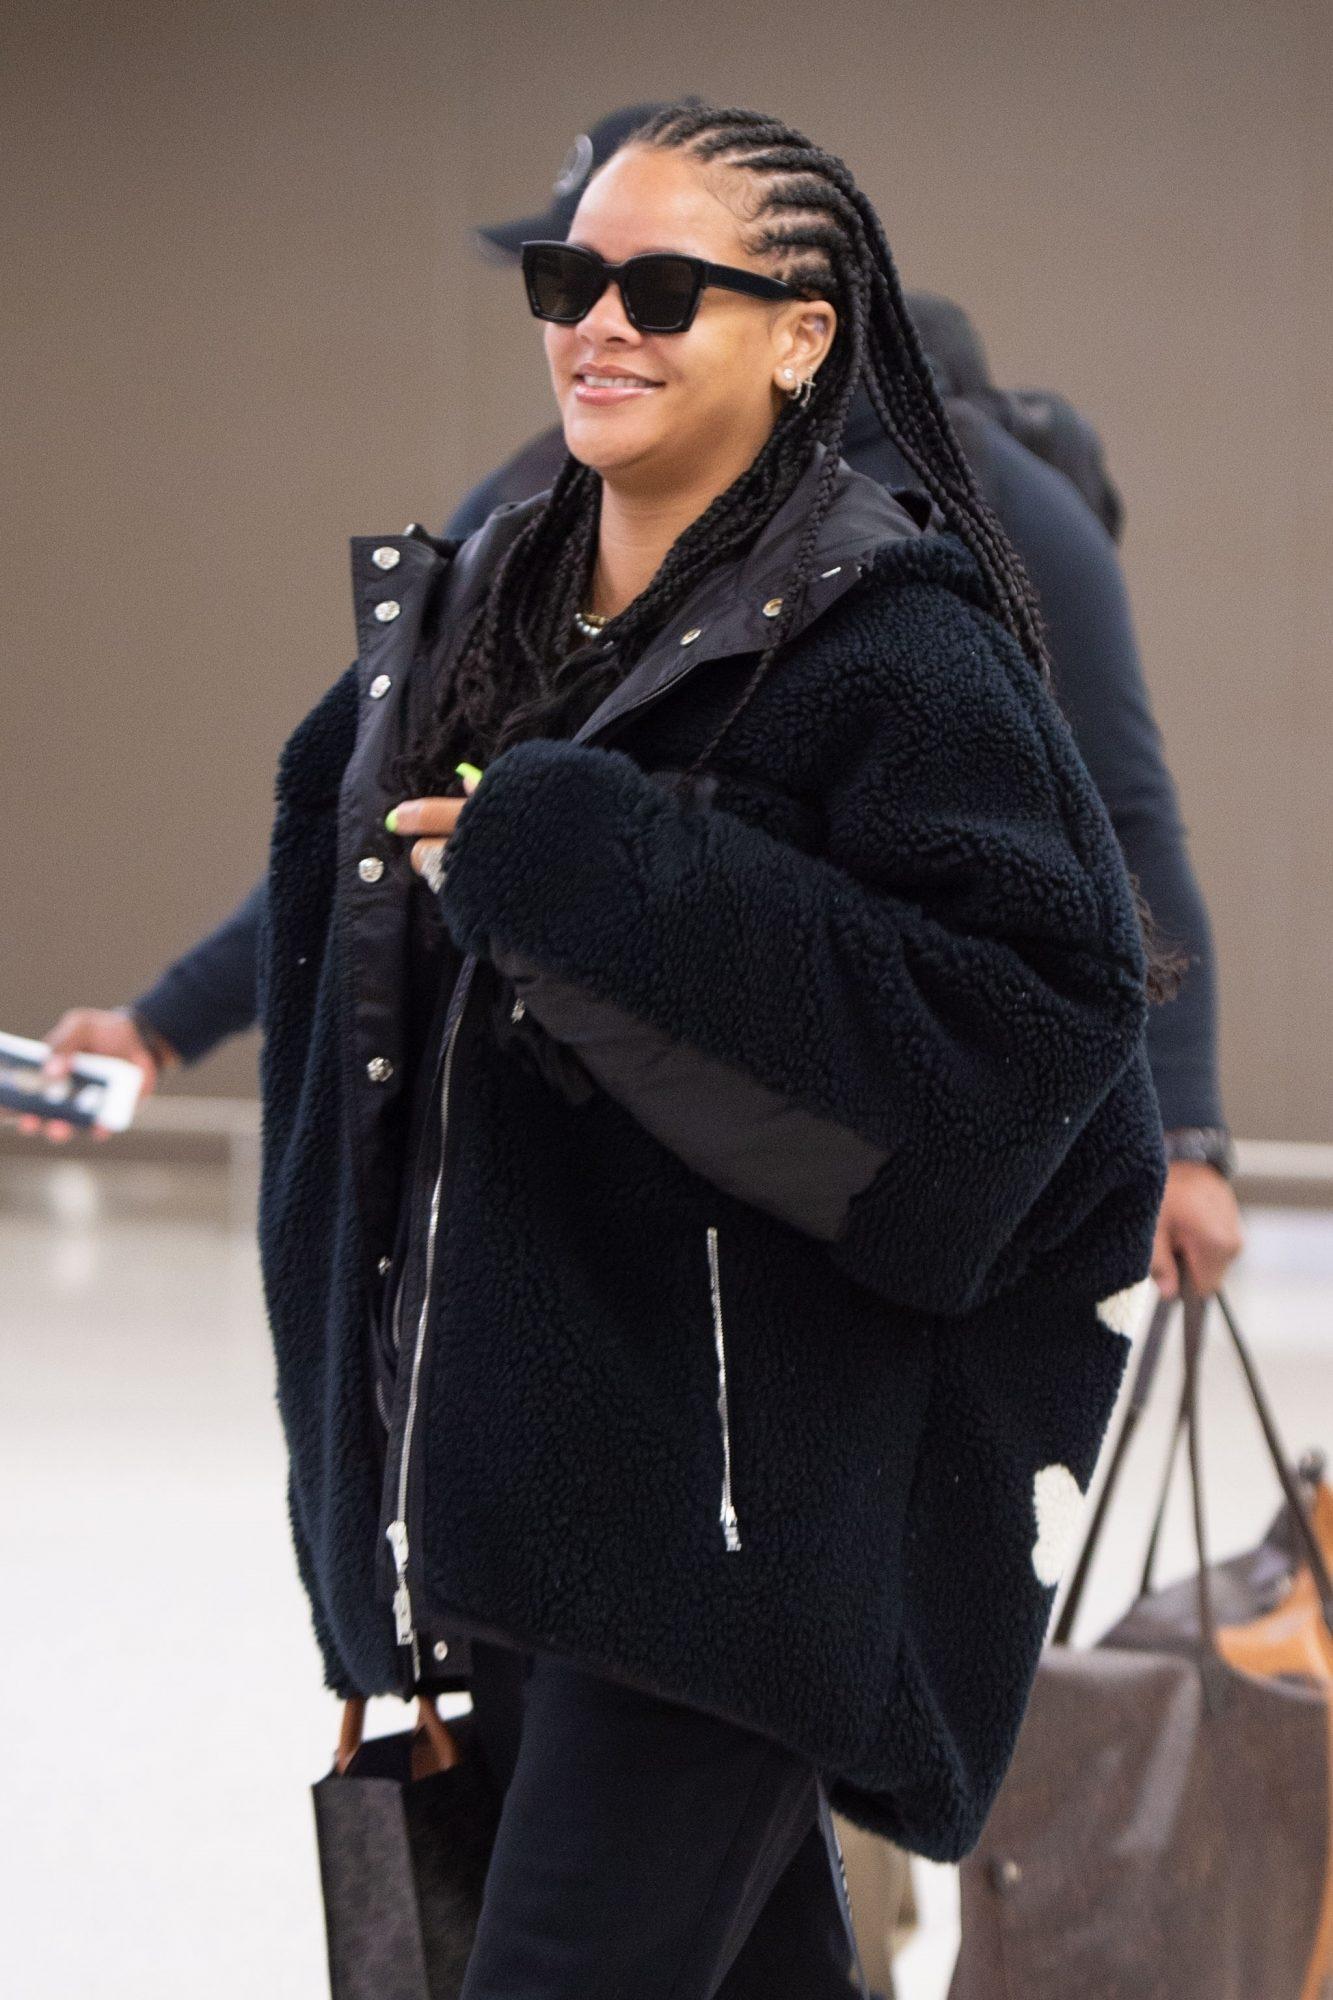 Rihanna arrives at JFK Airport